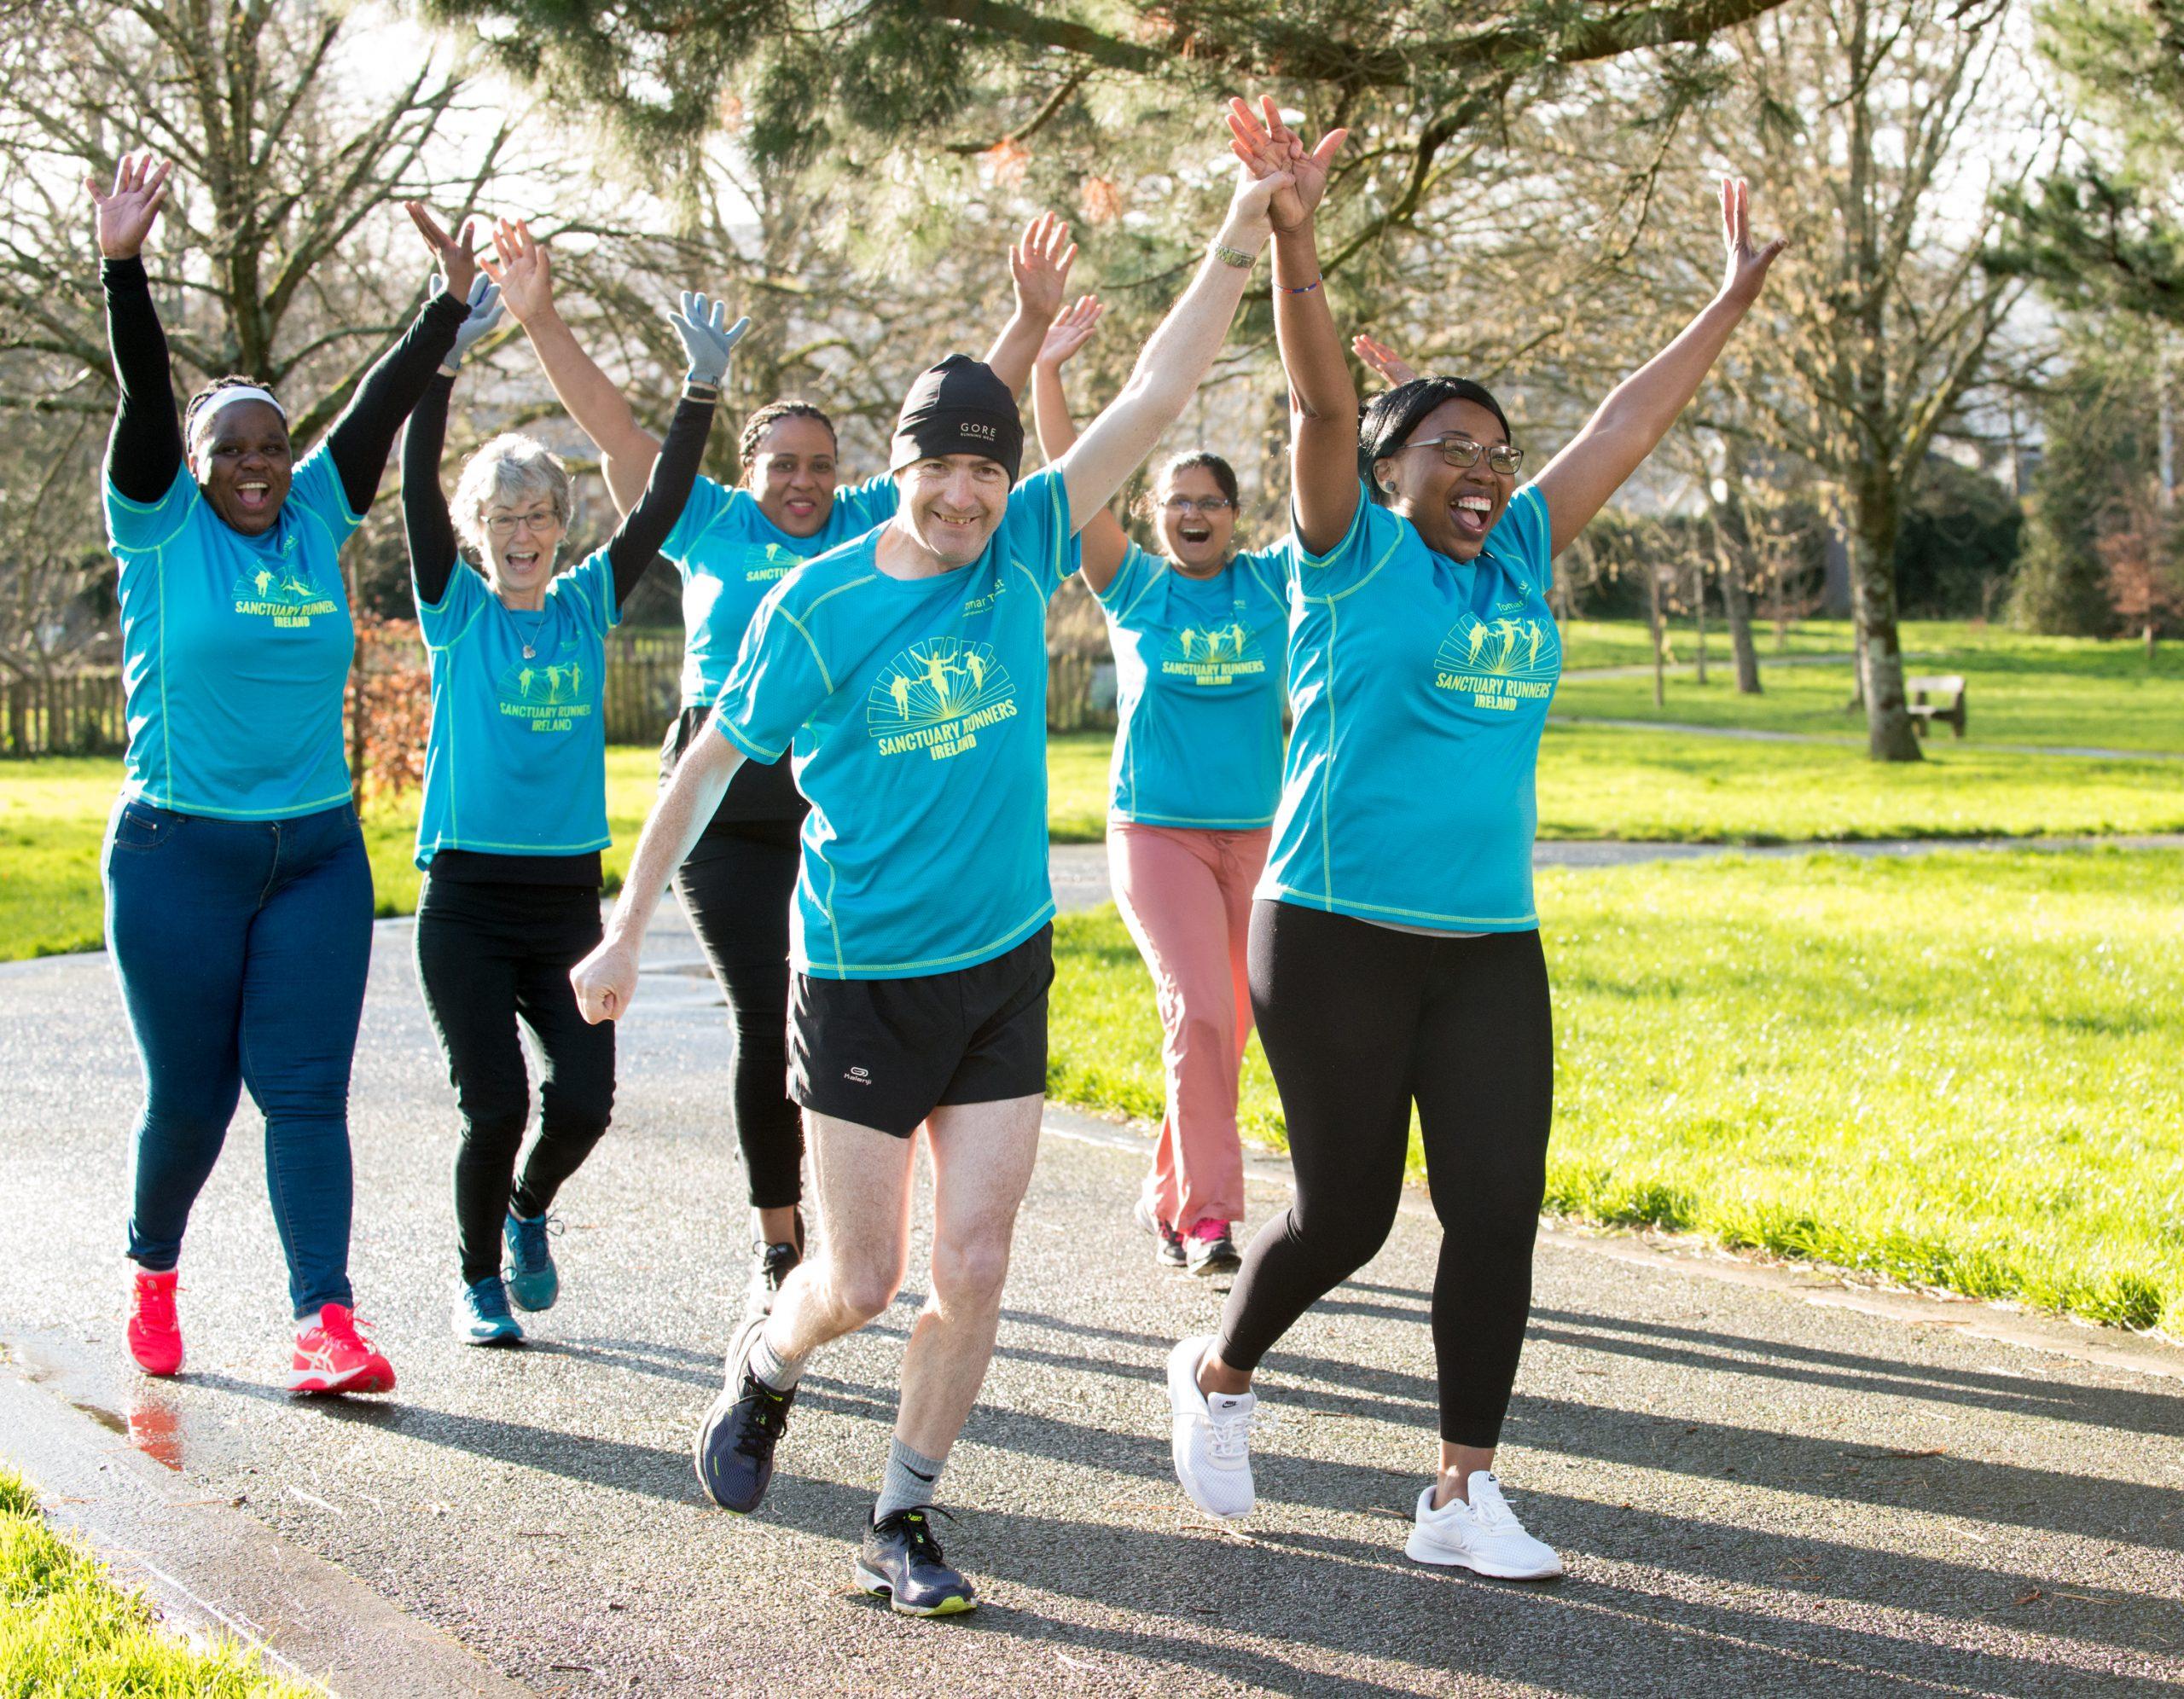 The Kingdom's Sanctuary Runners to run